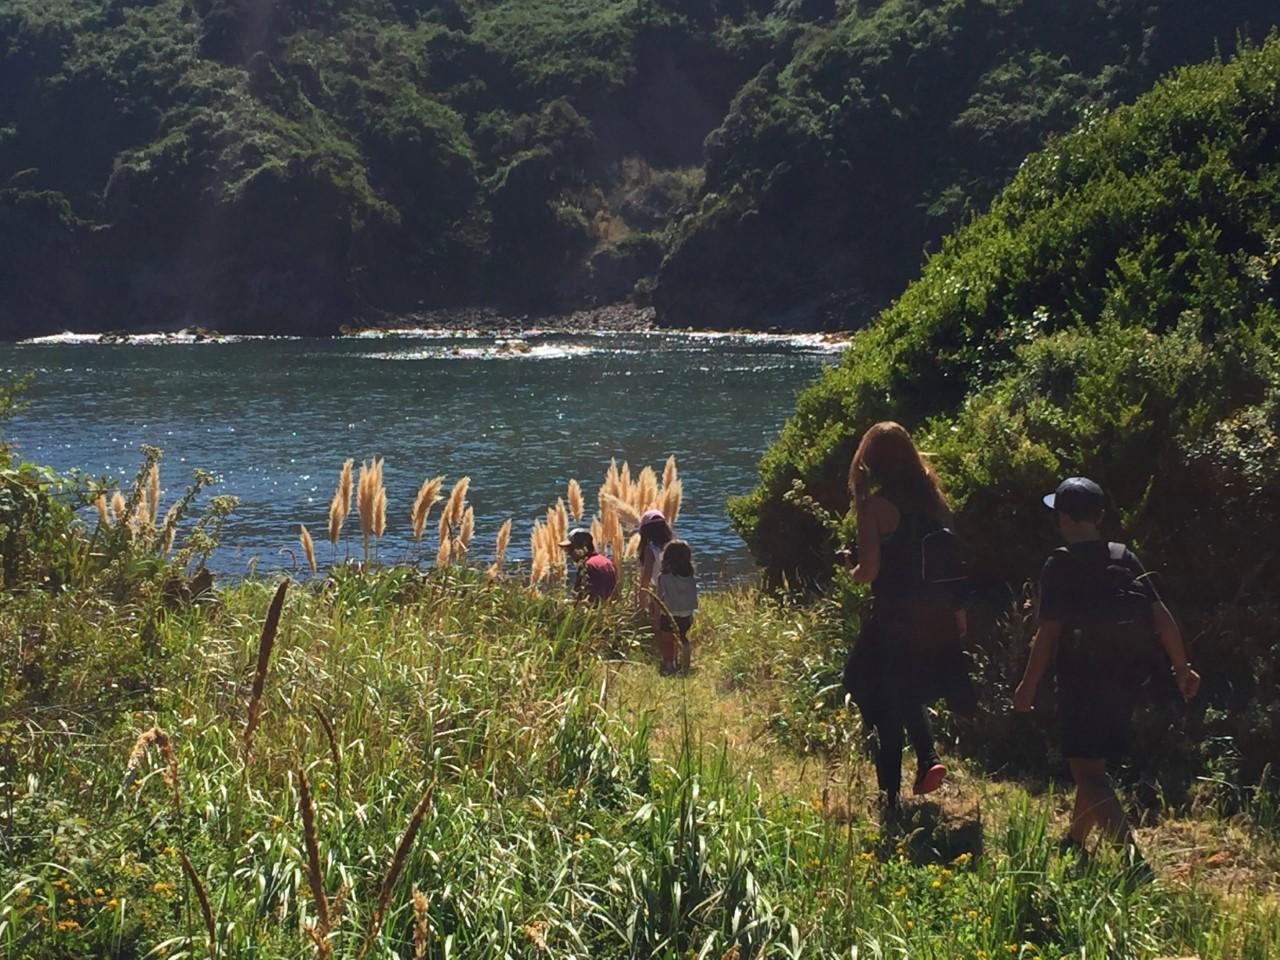 Trekking en Hotel Mari Mari con una familia caminando entre naturaleza